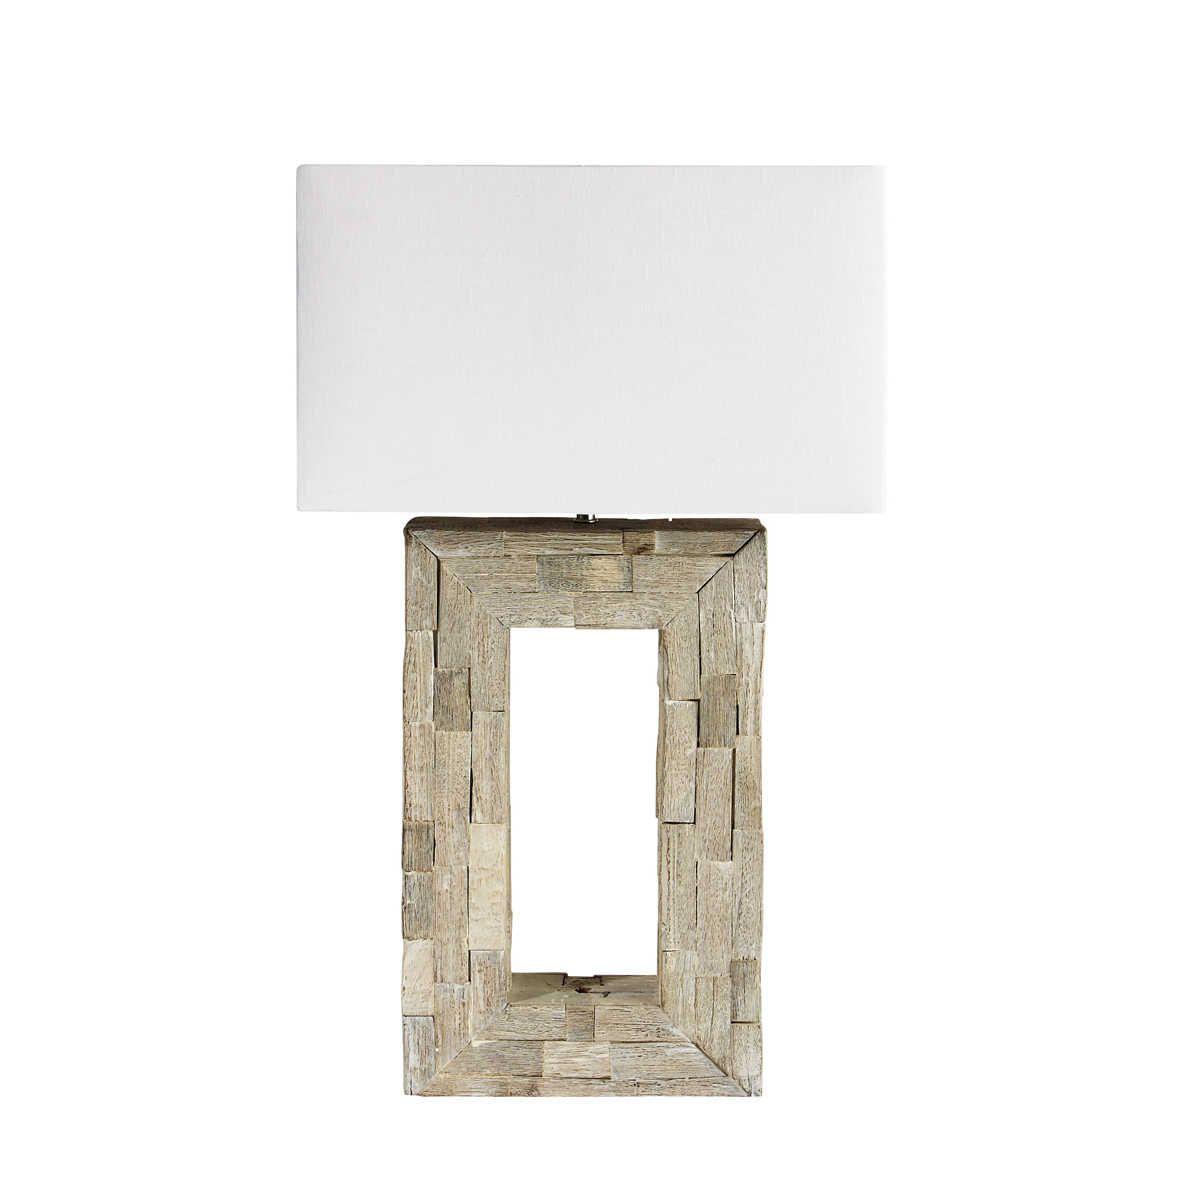 lampes poser d coration int rieur lampe bois maison. Black Bedroom Furniture Sets. Home Design Ideas